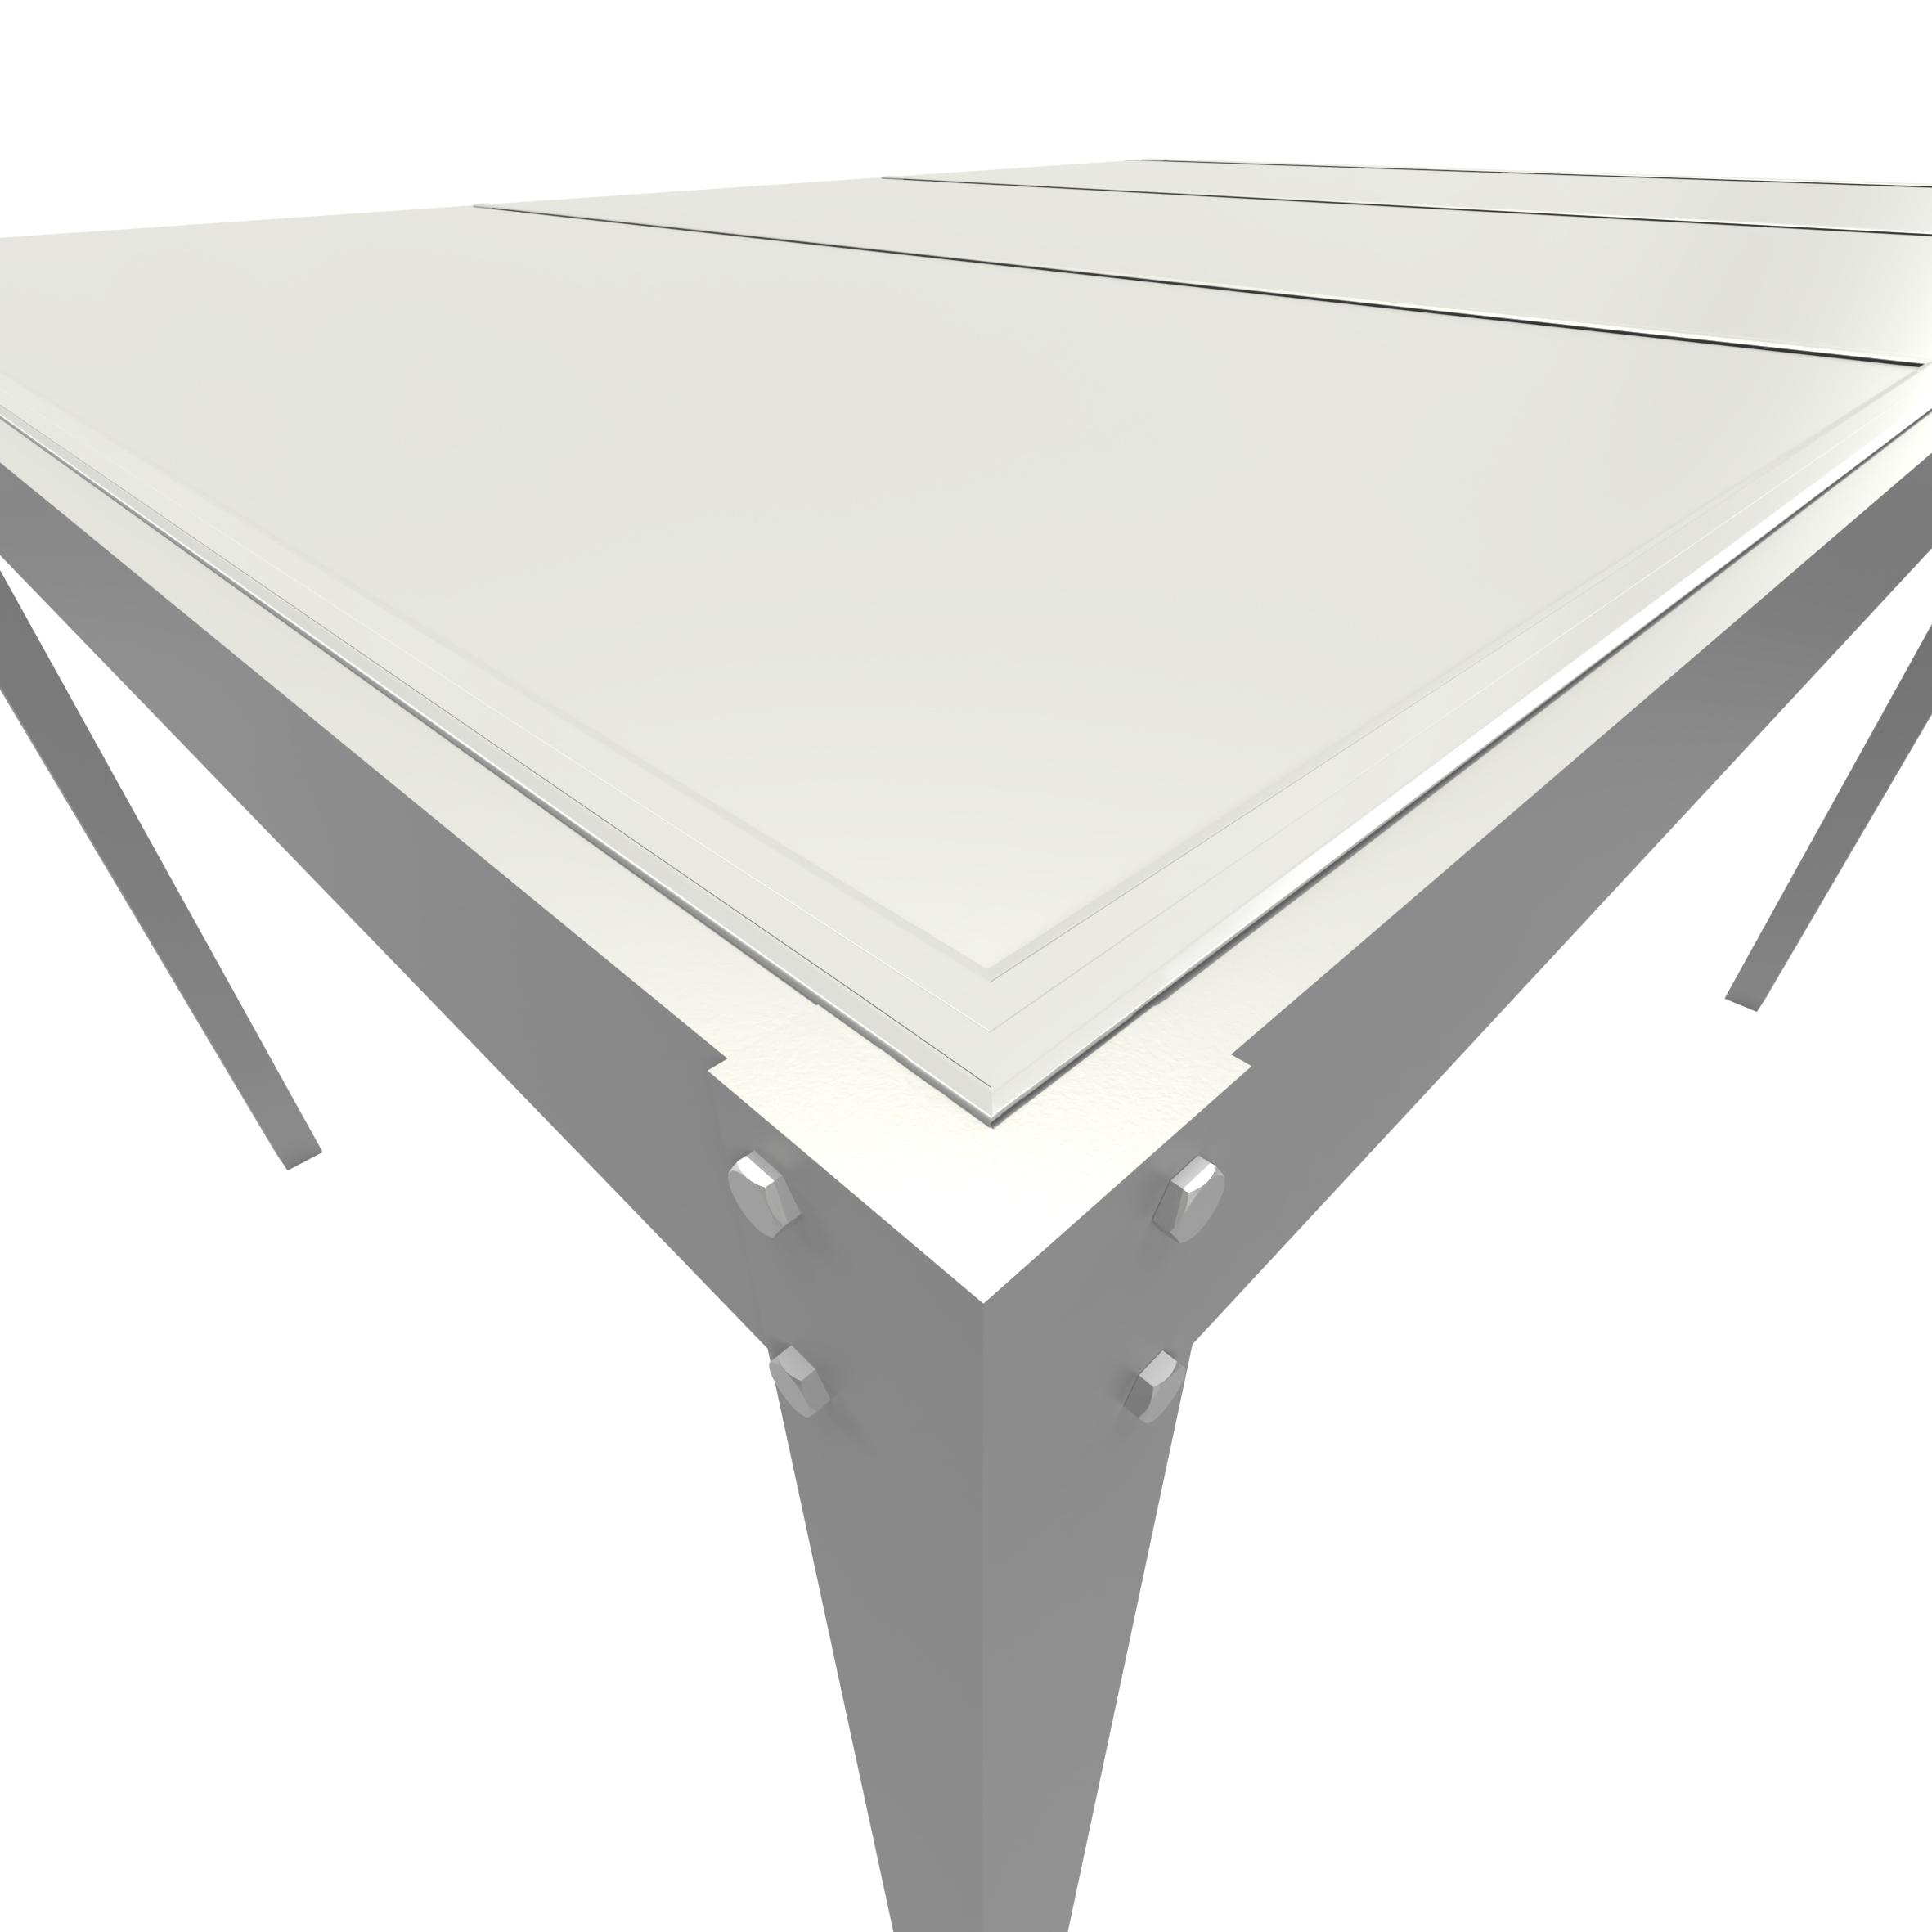 https://www.allpaint.it/wp-content/uploads/2021/07/gazebo-shadow-alluminio-allpaint.jpg